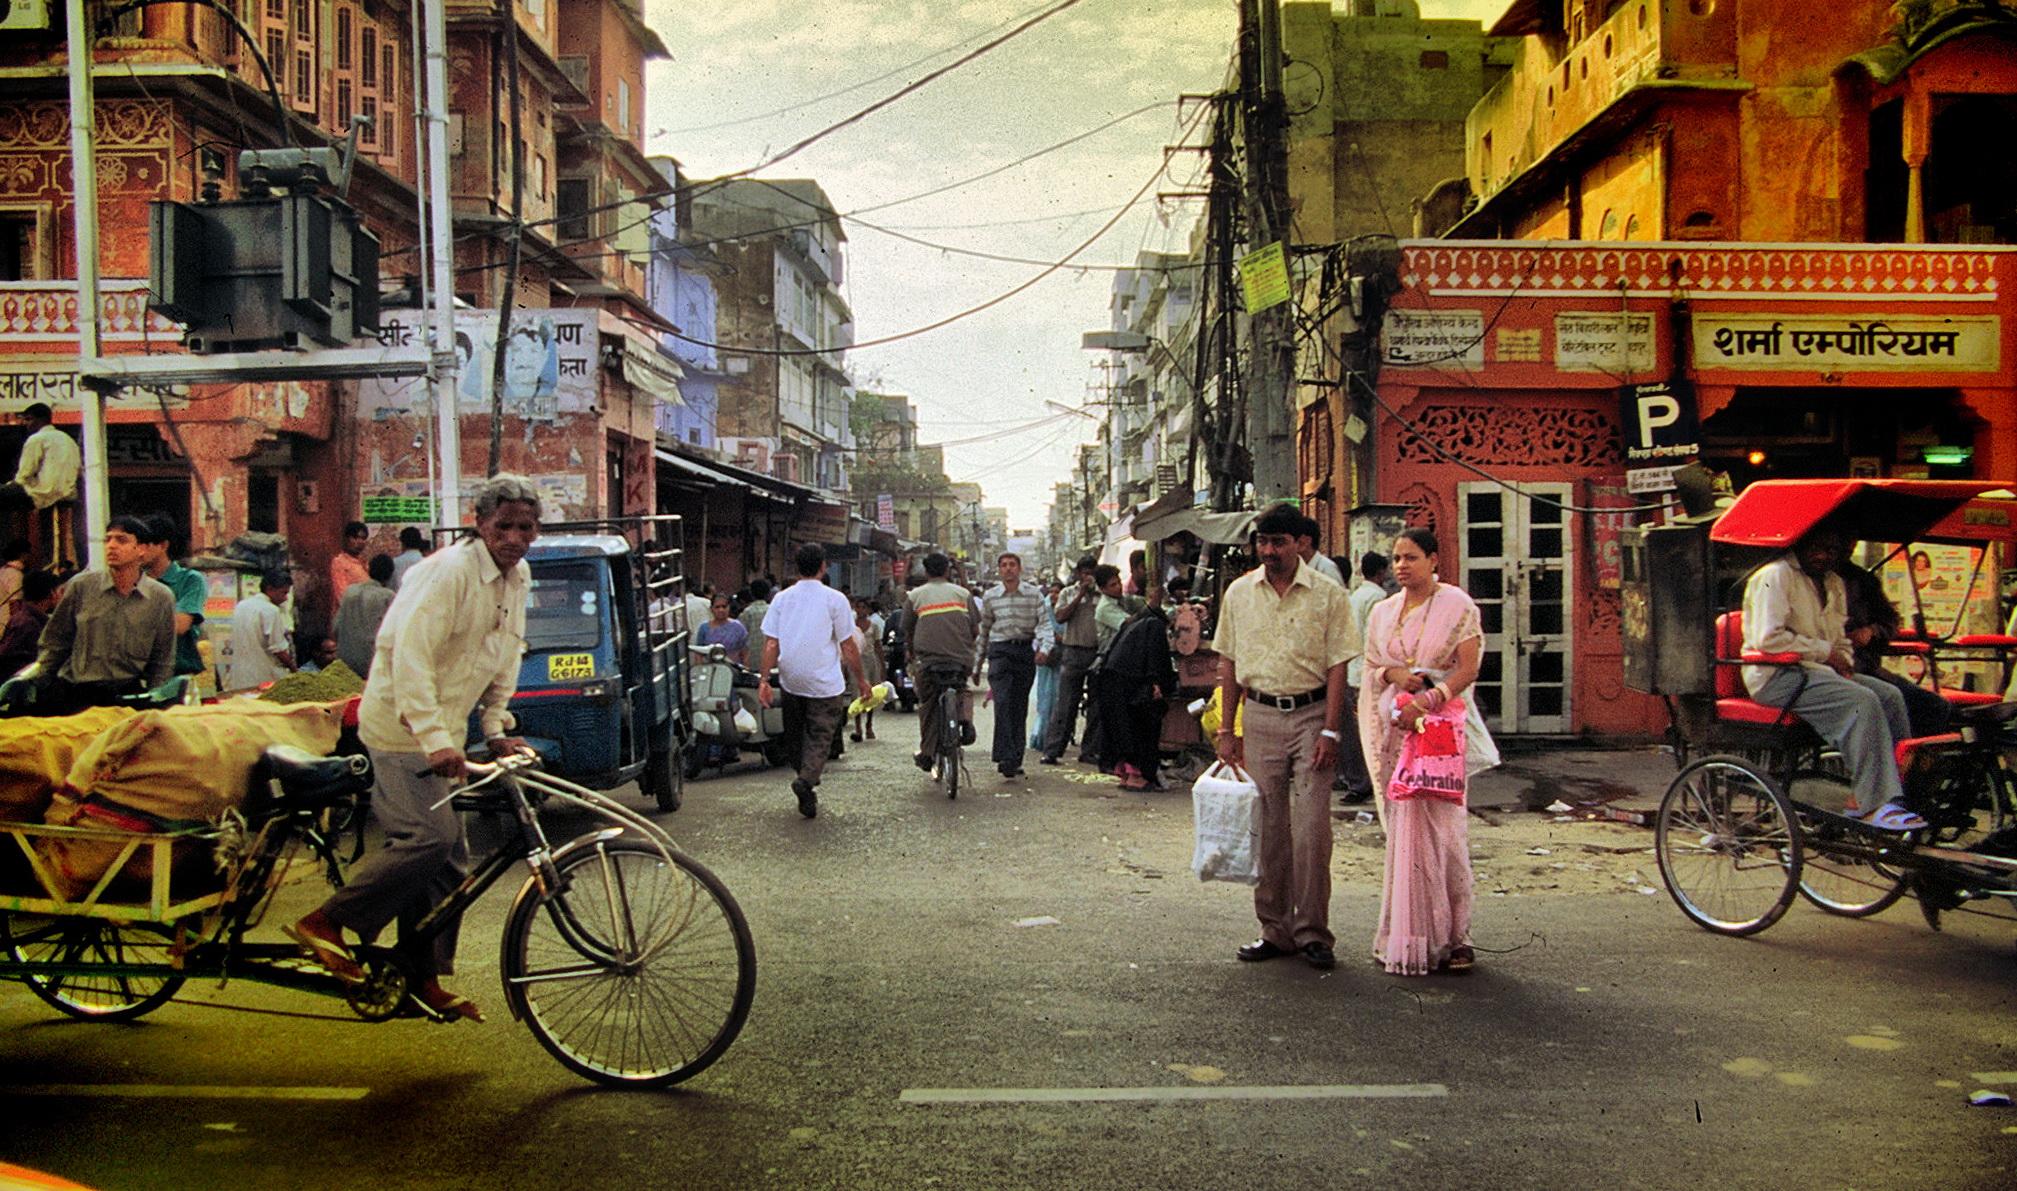 Varanasi street HDR...